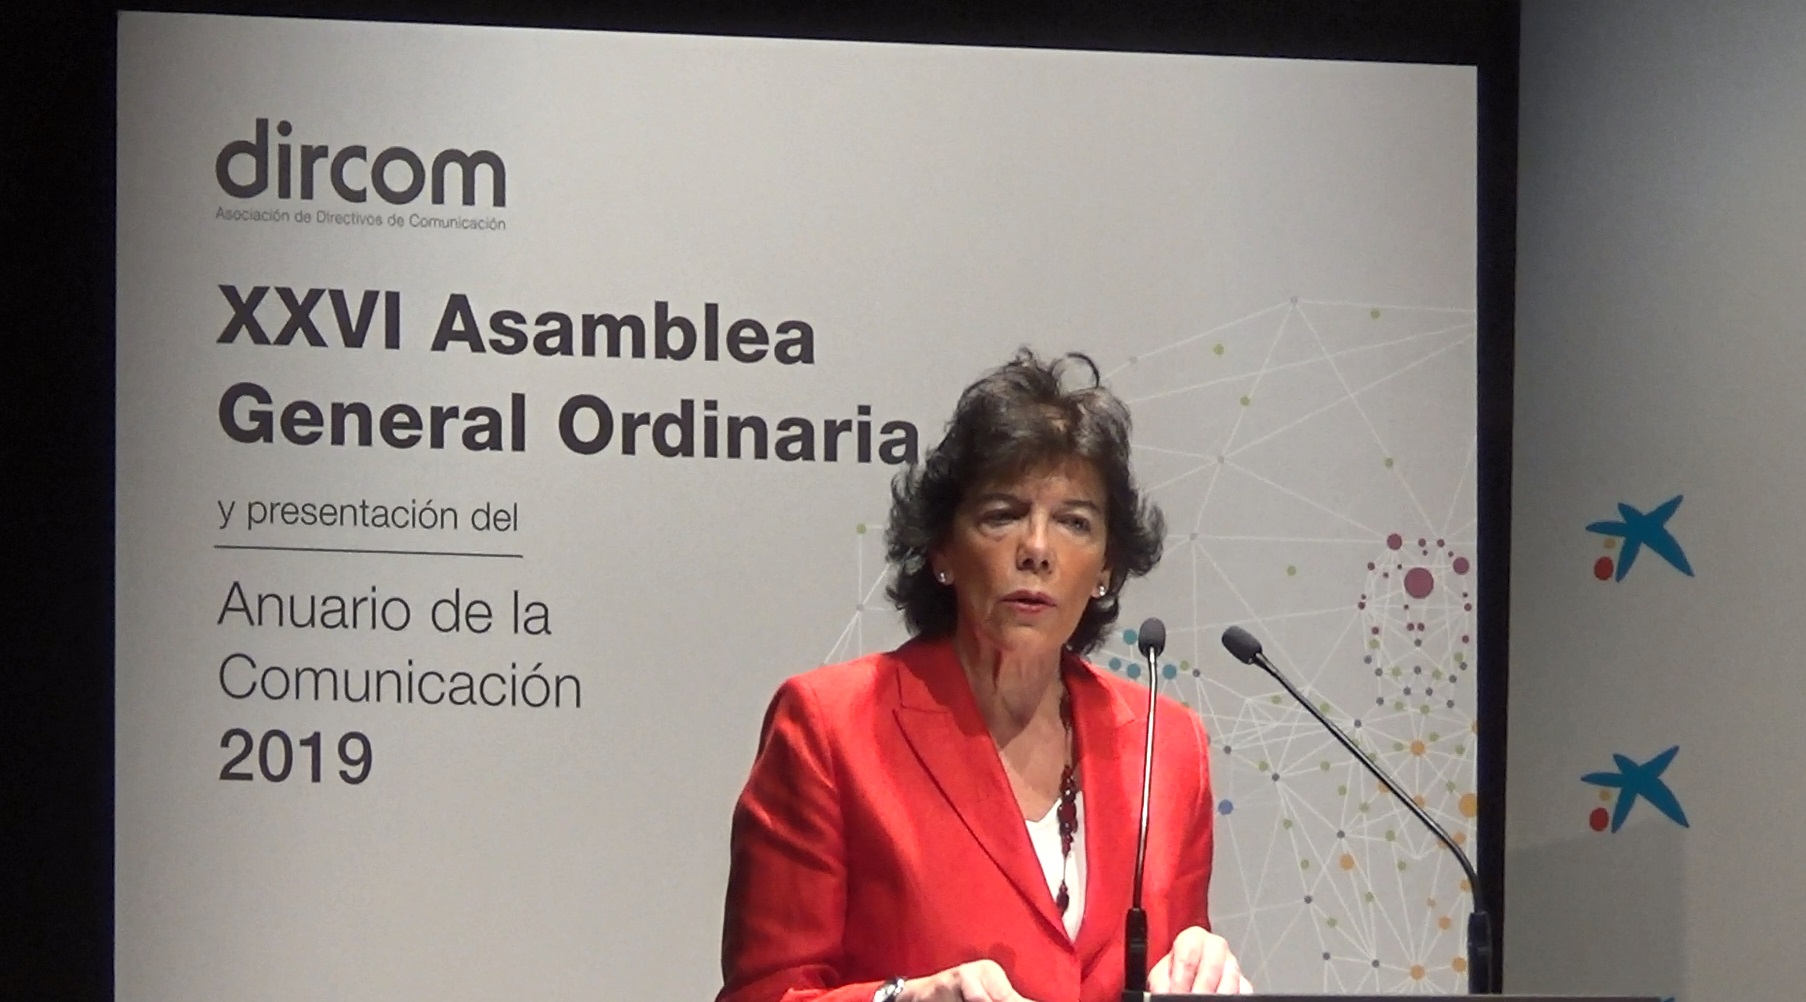 https://www.programapublicidad.com/wp-content/uploads/2019/07/ministra-educación-celaa-isabel-dircom-asamblea-programapublicidad-muy-grande.jpg